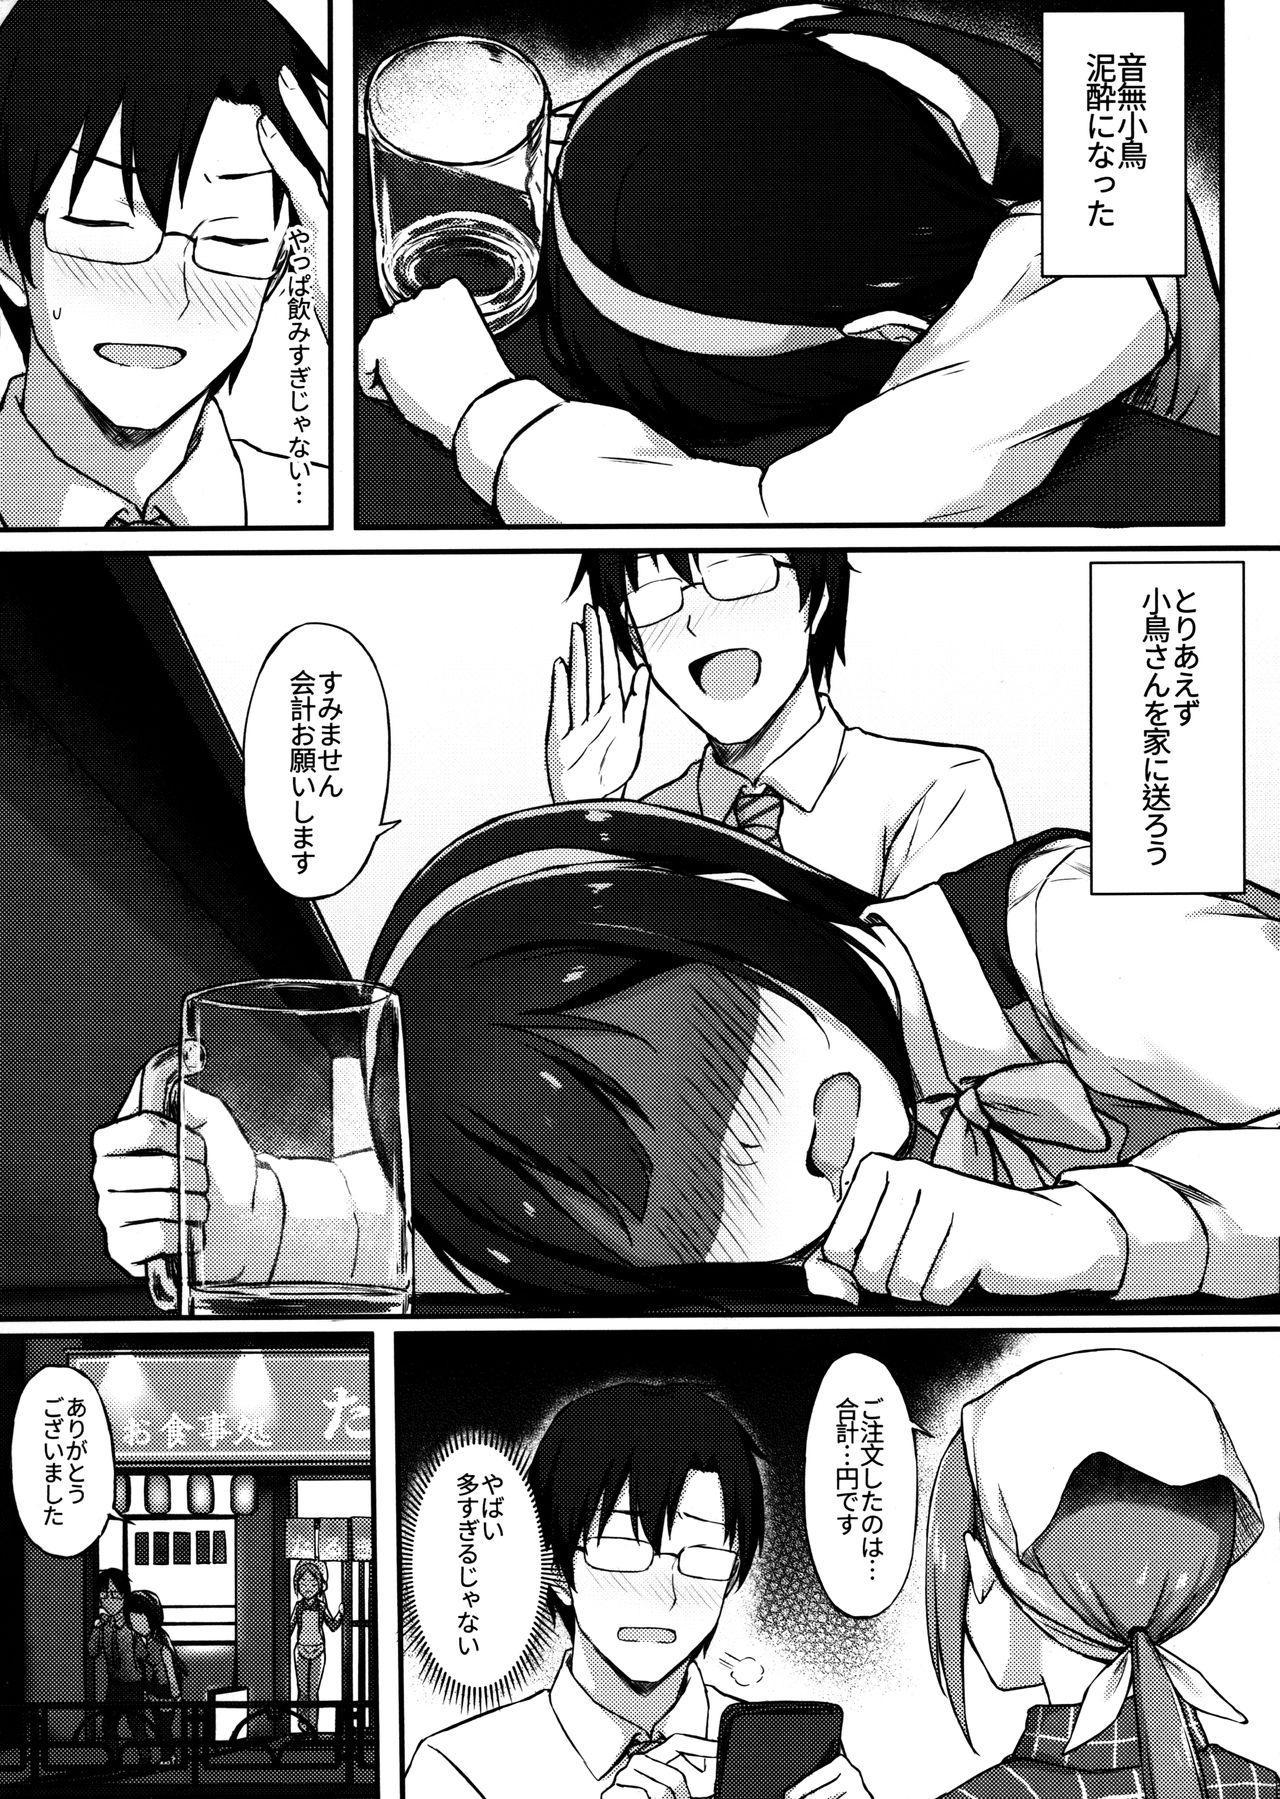 Kotori-san to Nomikai... Shite kara + Omake 5